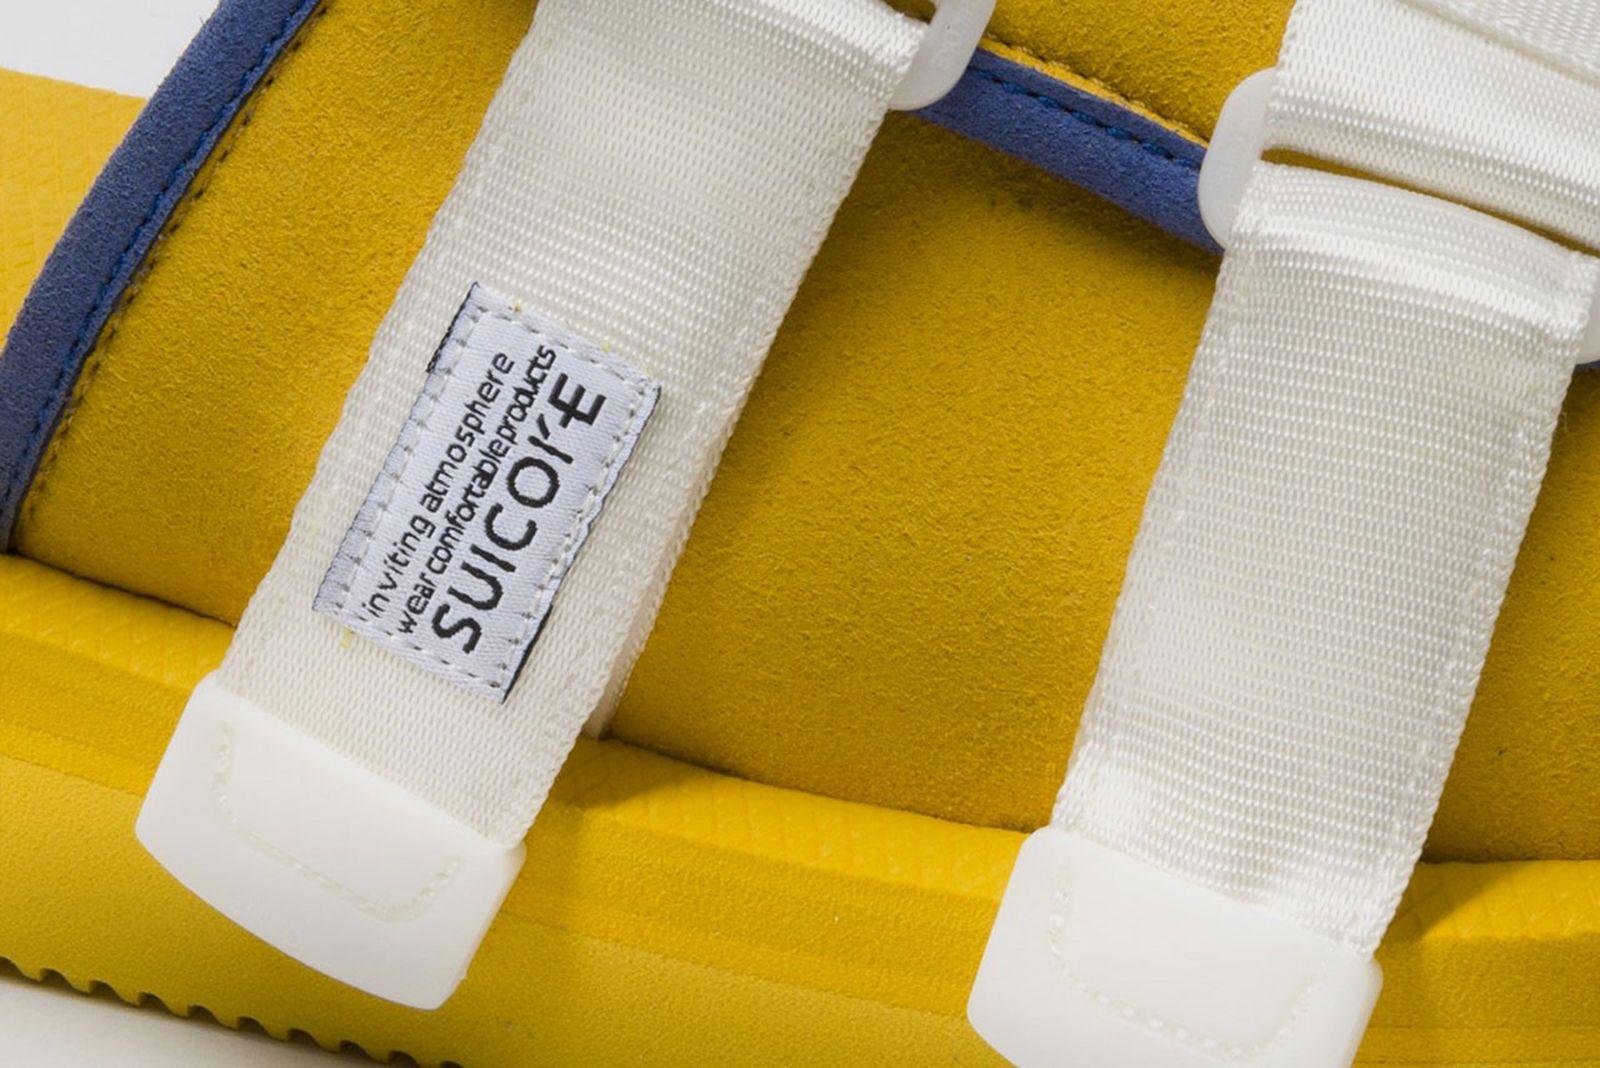 golf wang suicoke kaw cab yellow release date price tyler the creator